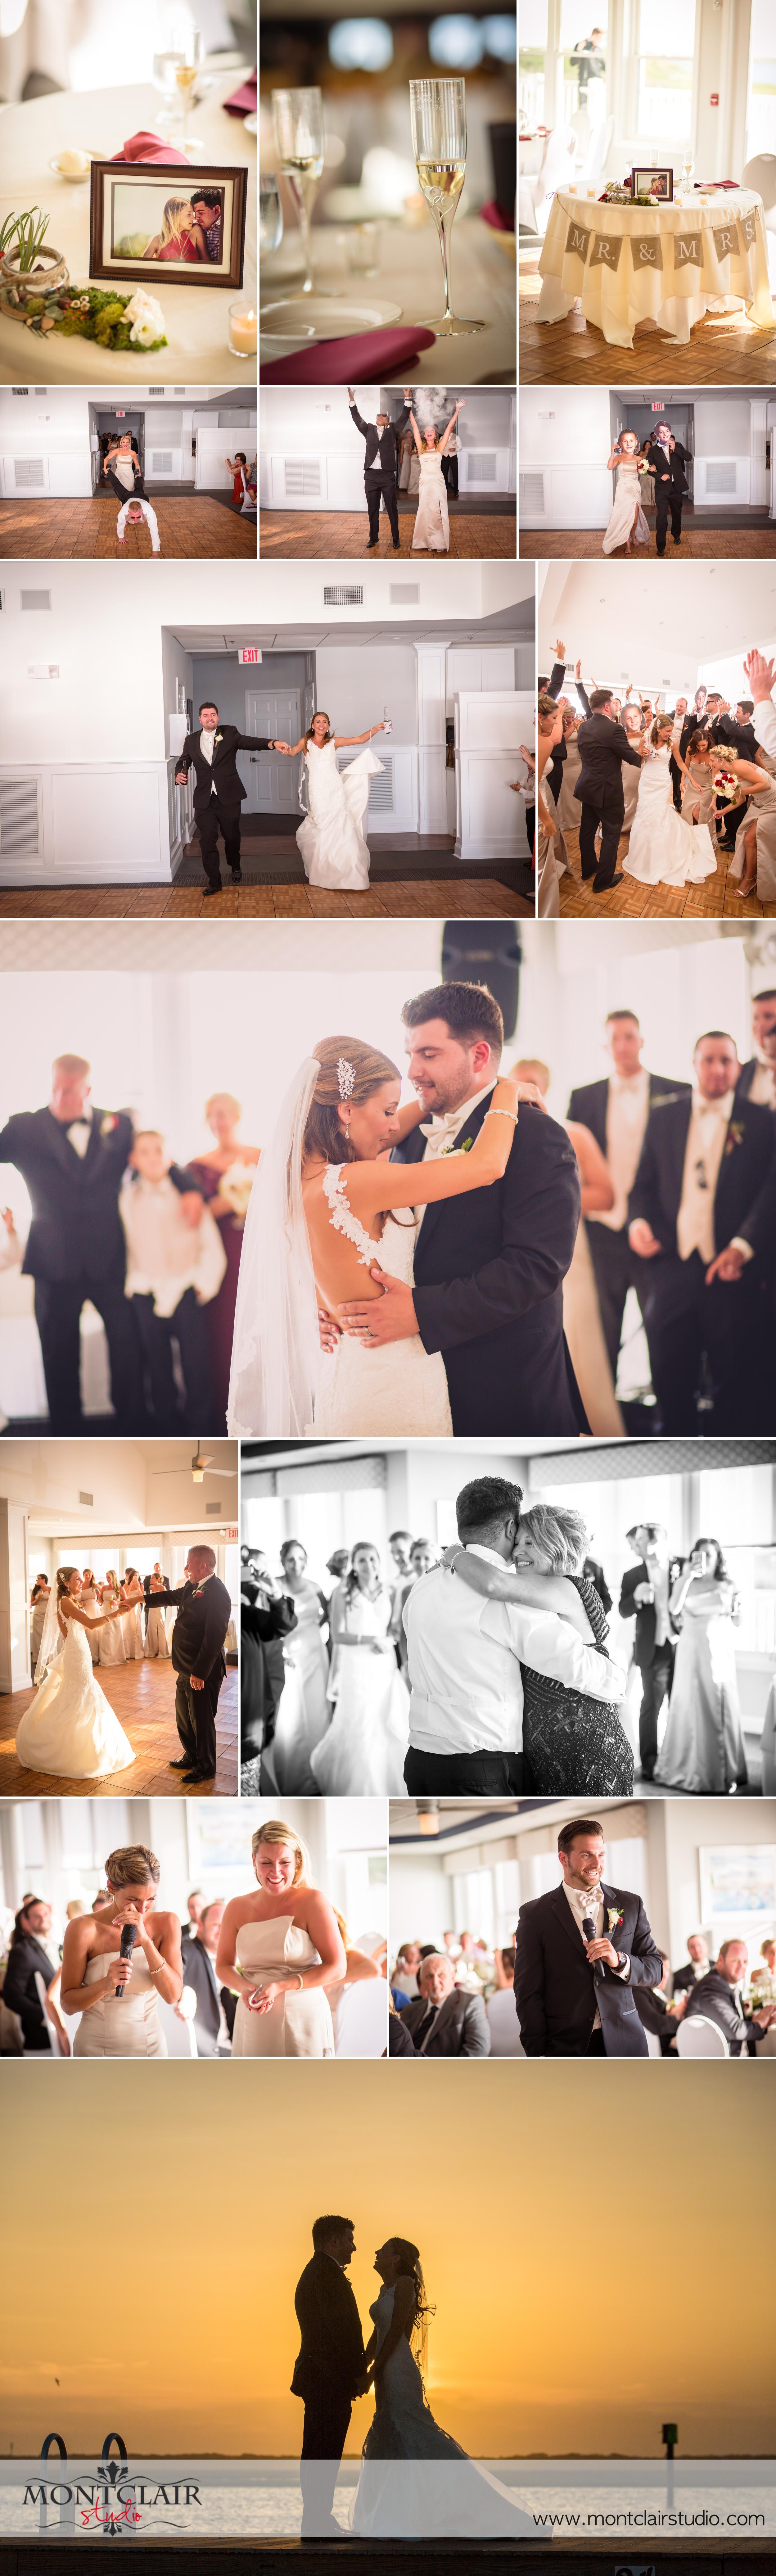 Wedding Ally and Dan 2.jpg